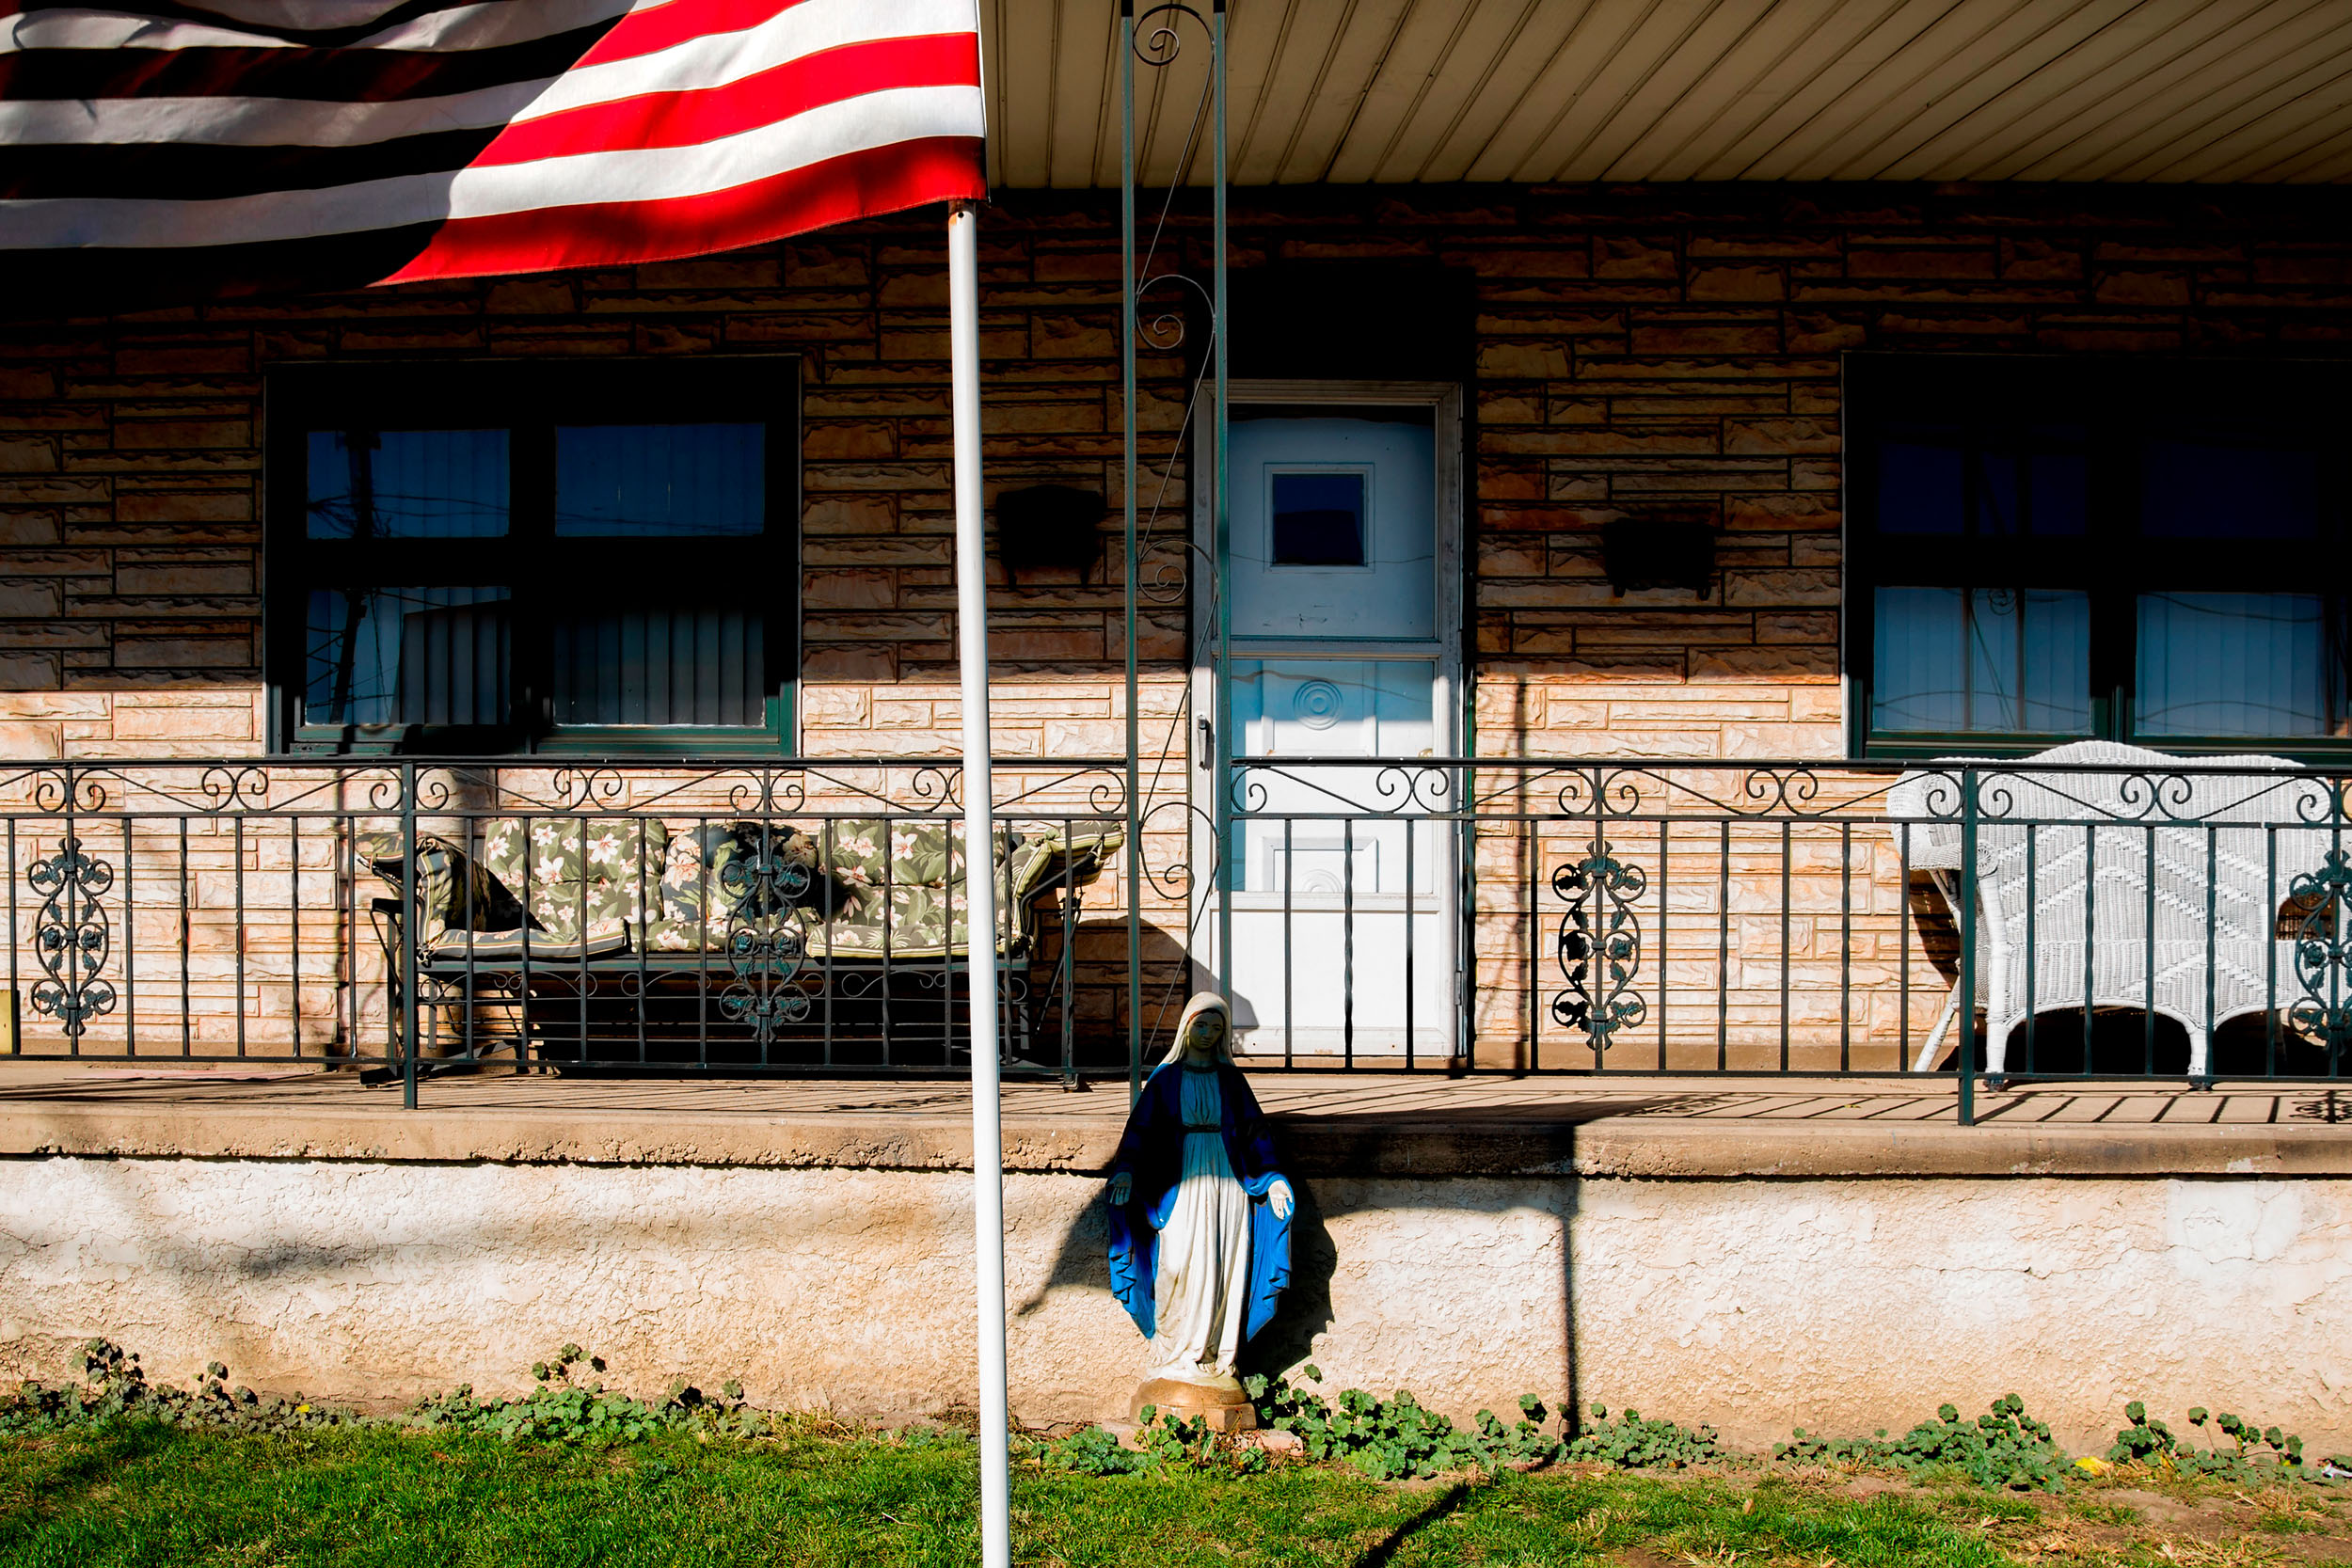 Parker Reinecker, Home, Scranton, Pennsylvania, Scranton, 2014 30 x 24 inches Archival Pigment Print